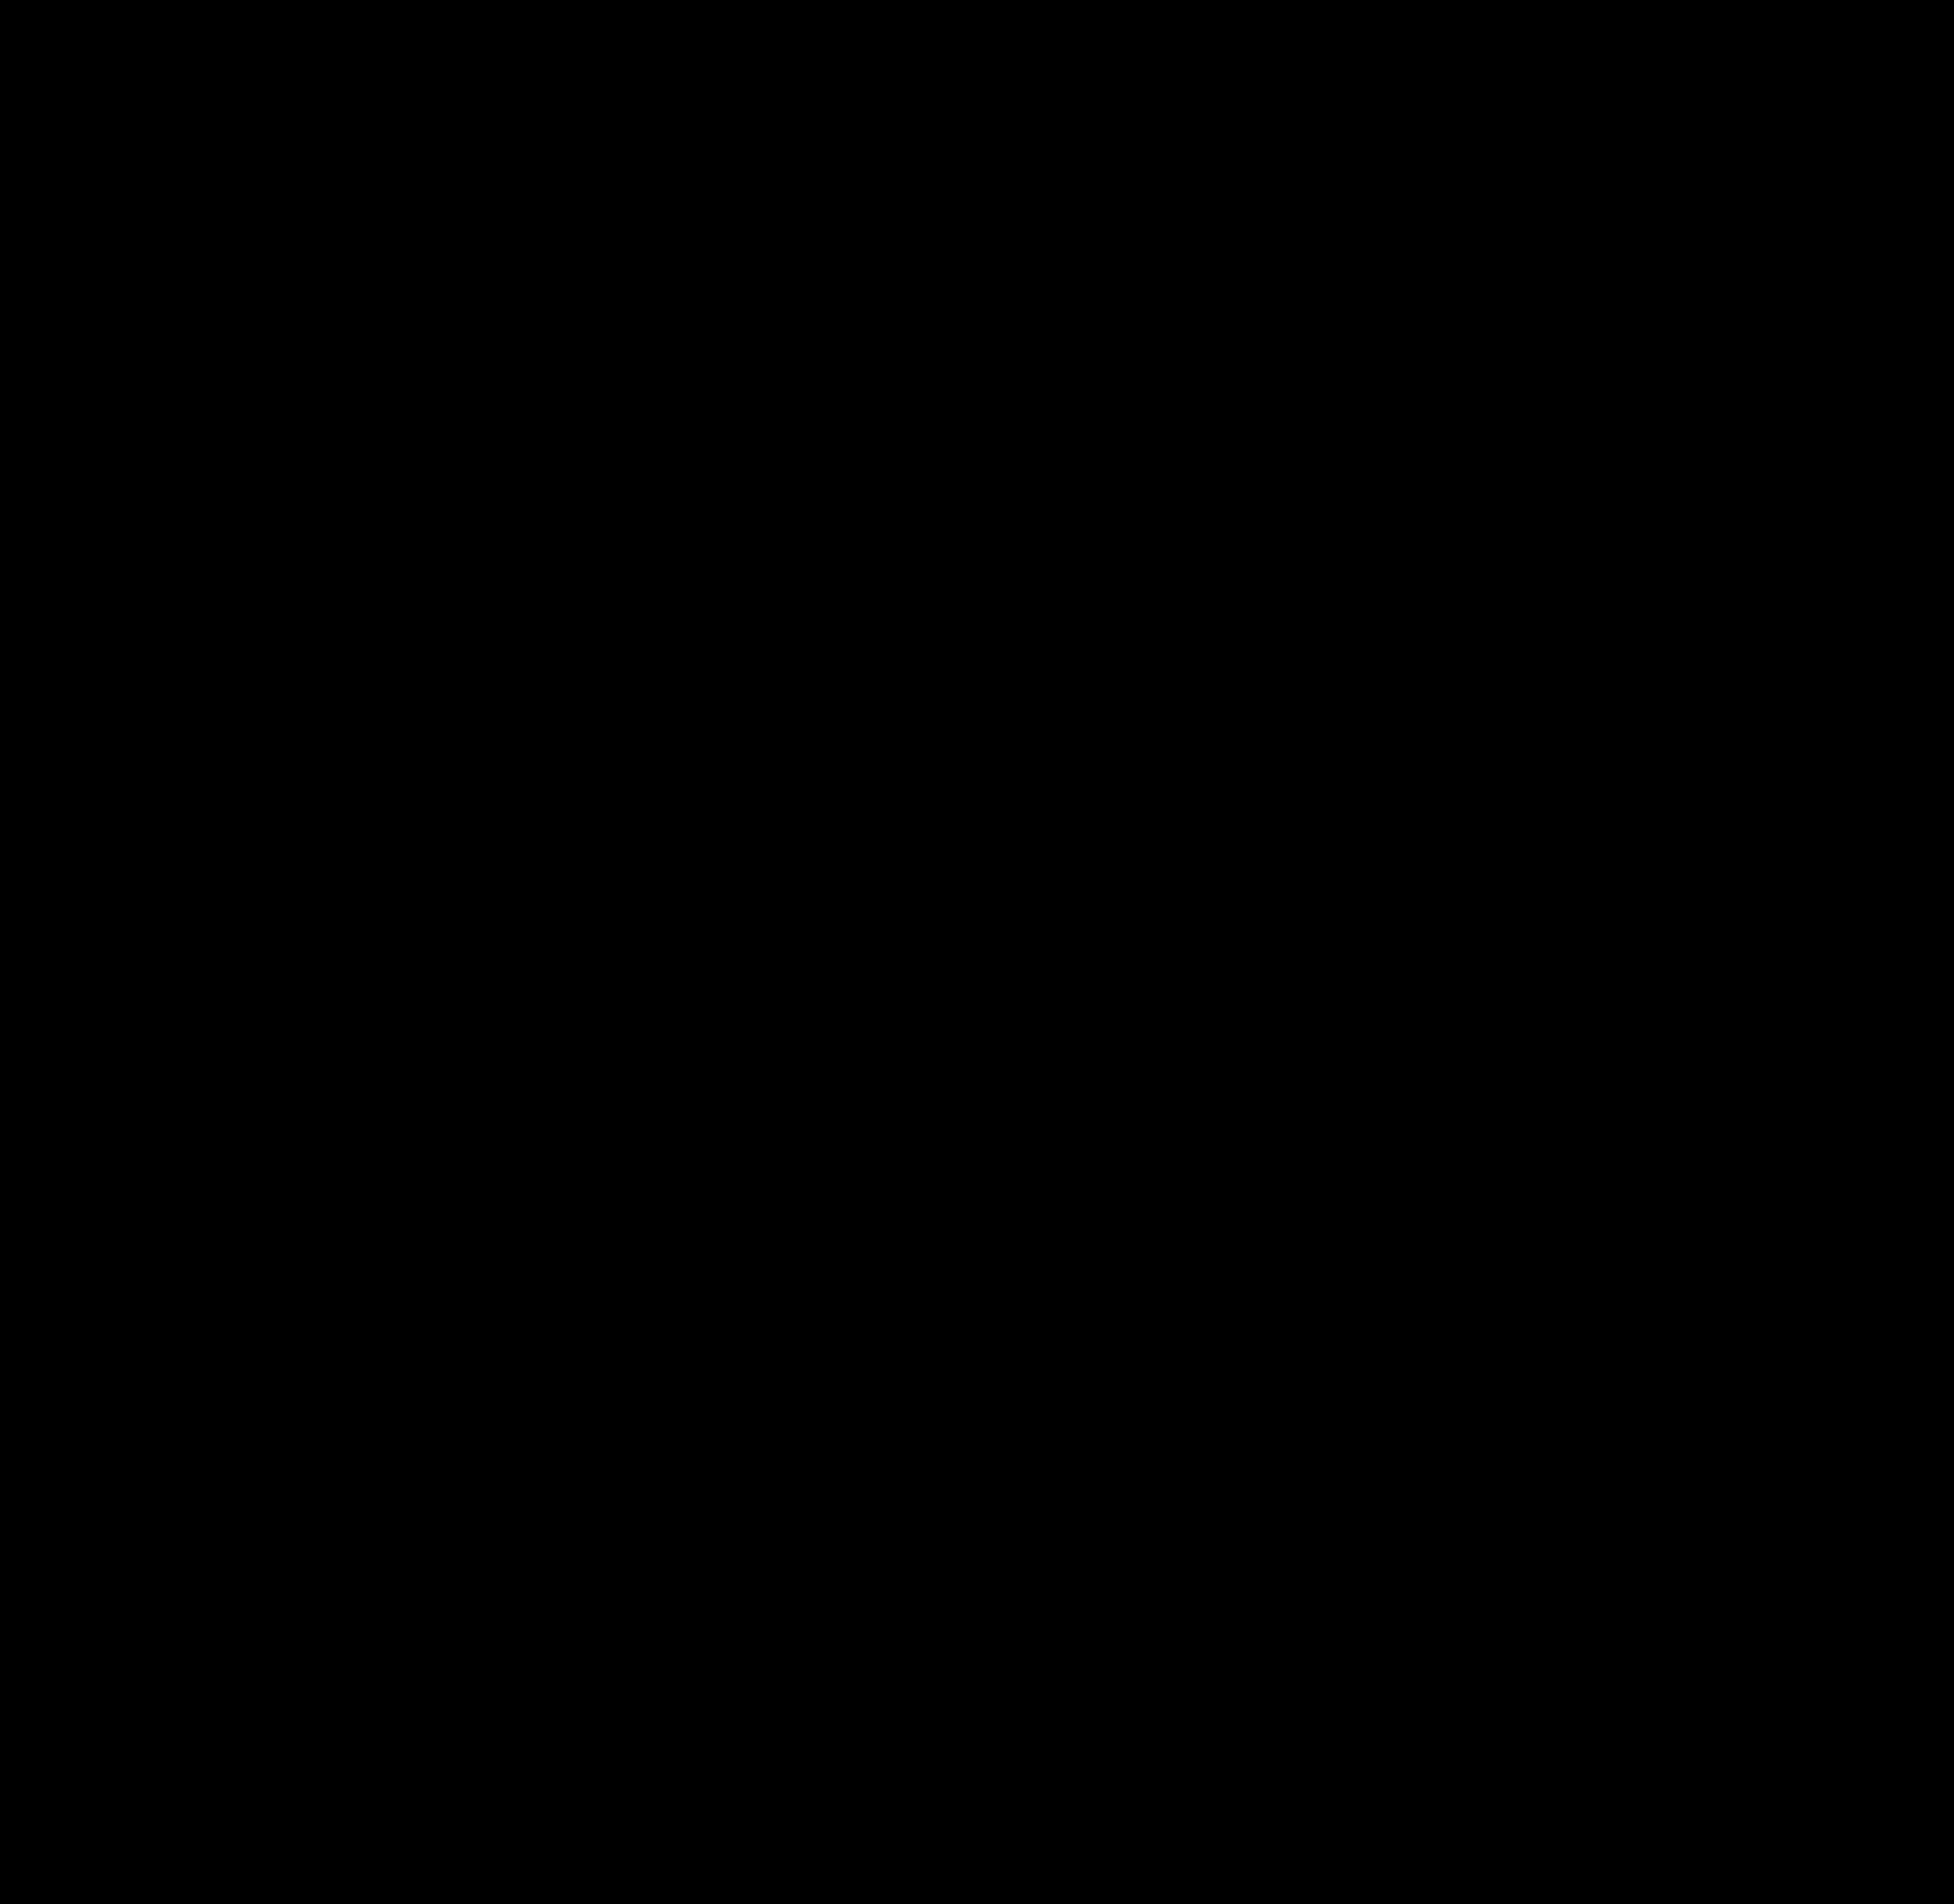 Sebastien Perrier - Polymer Chemistry